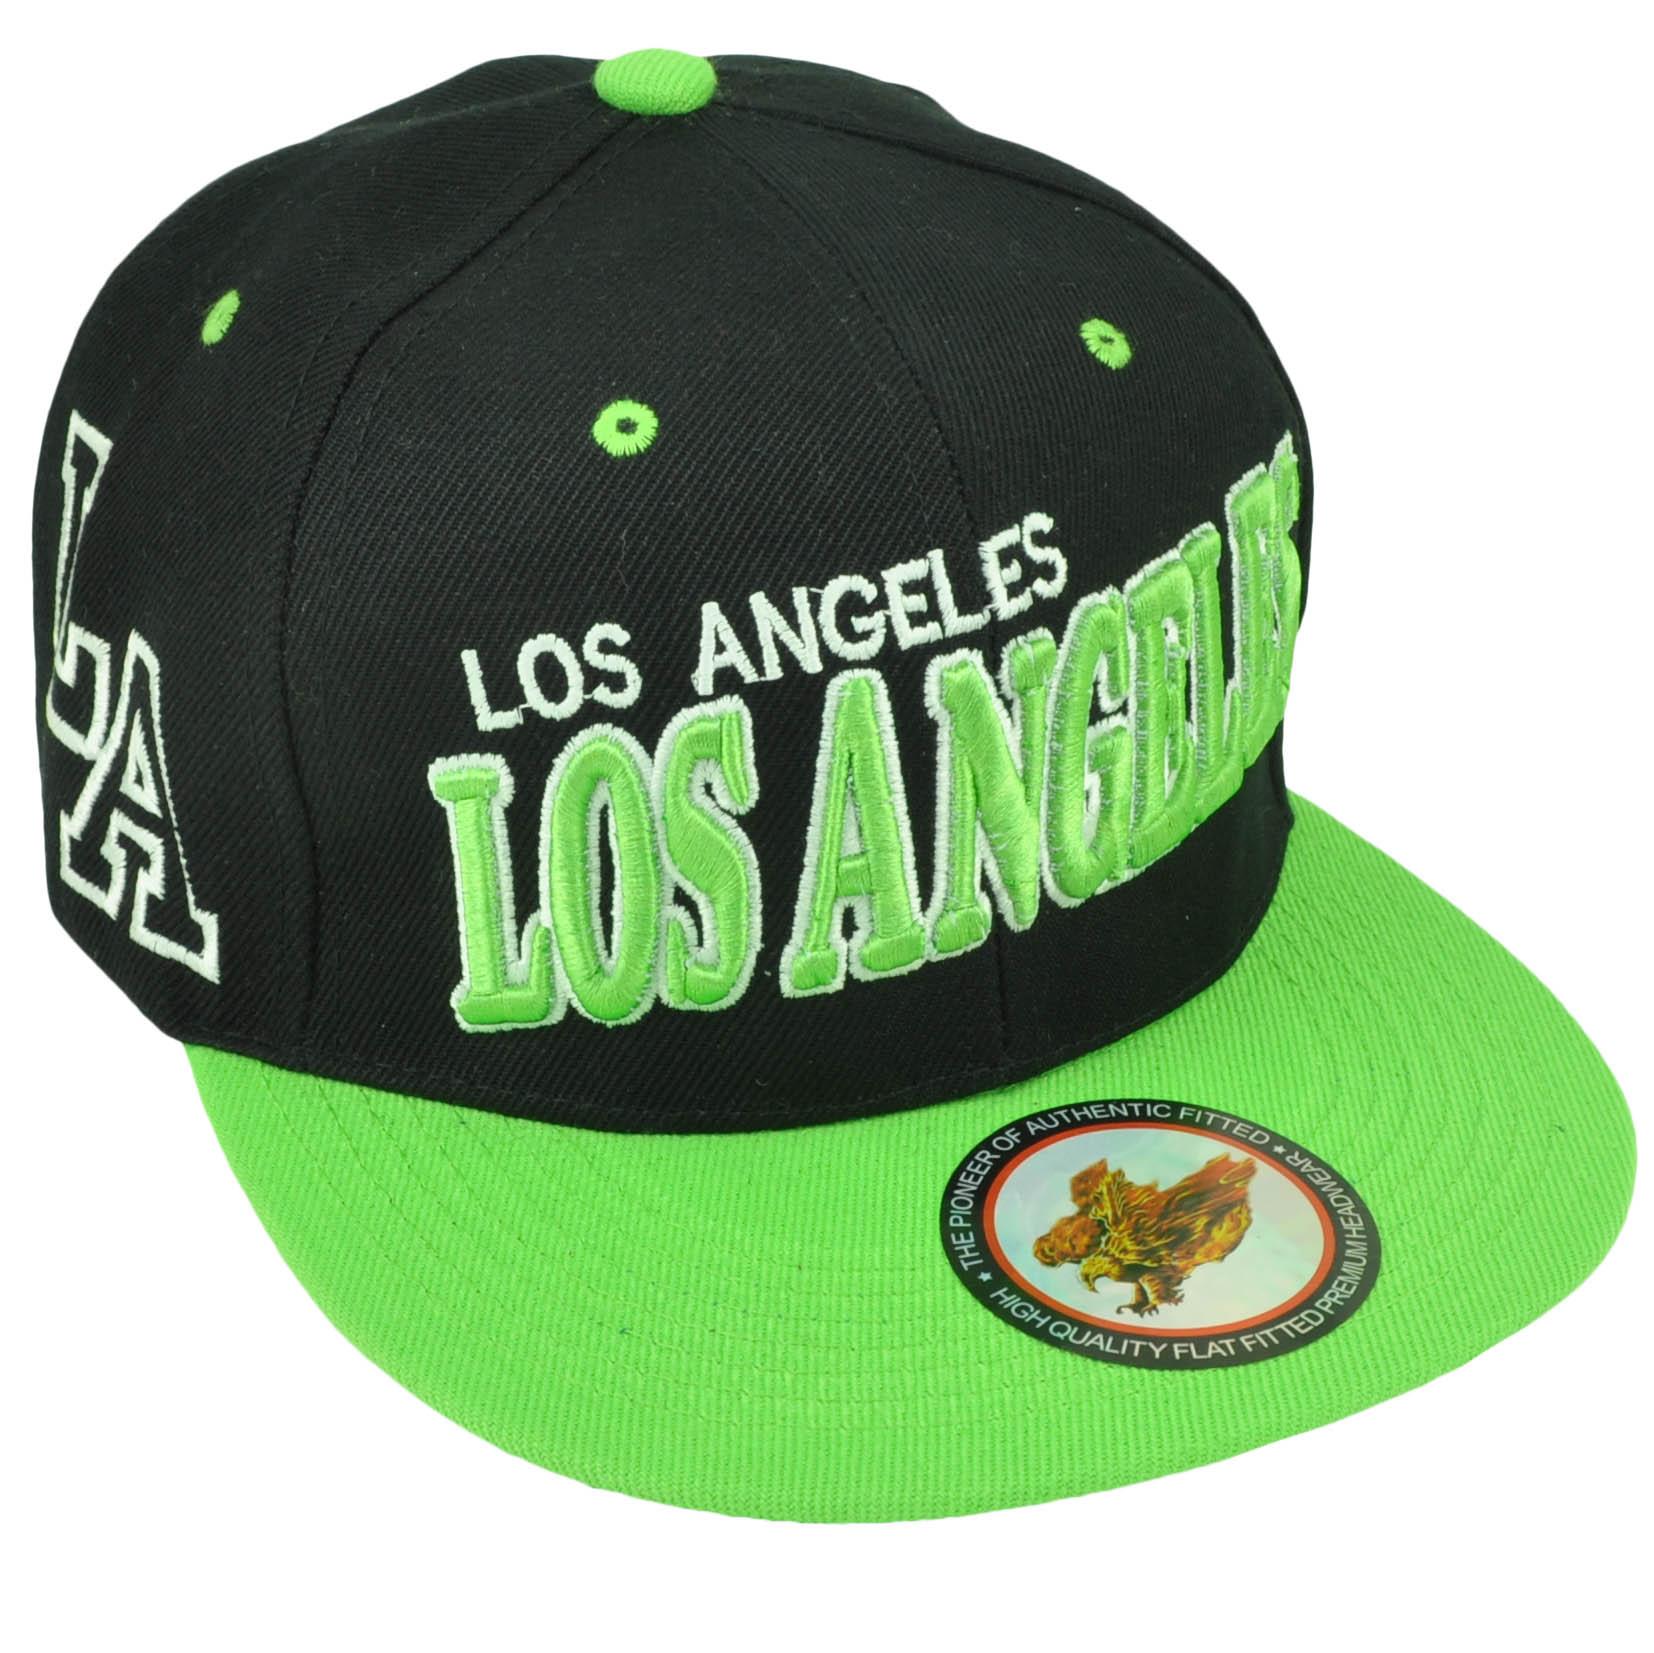 c65eb04ba9c Los Angeles City of Angels LA California CA Black Neon Green Snapback Hat  Cap